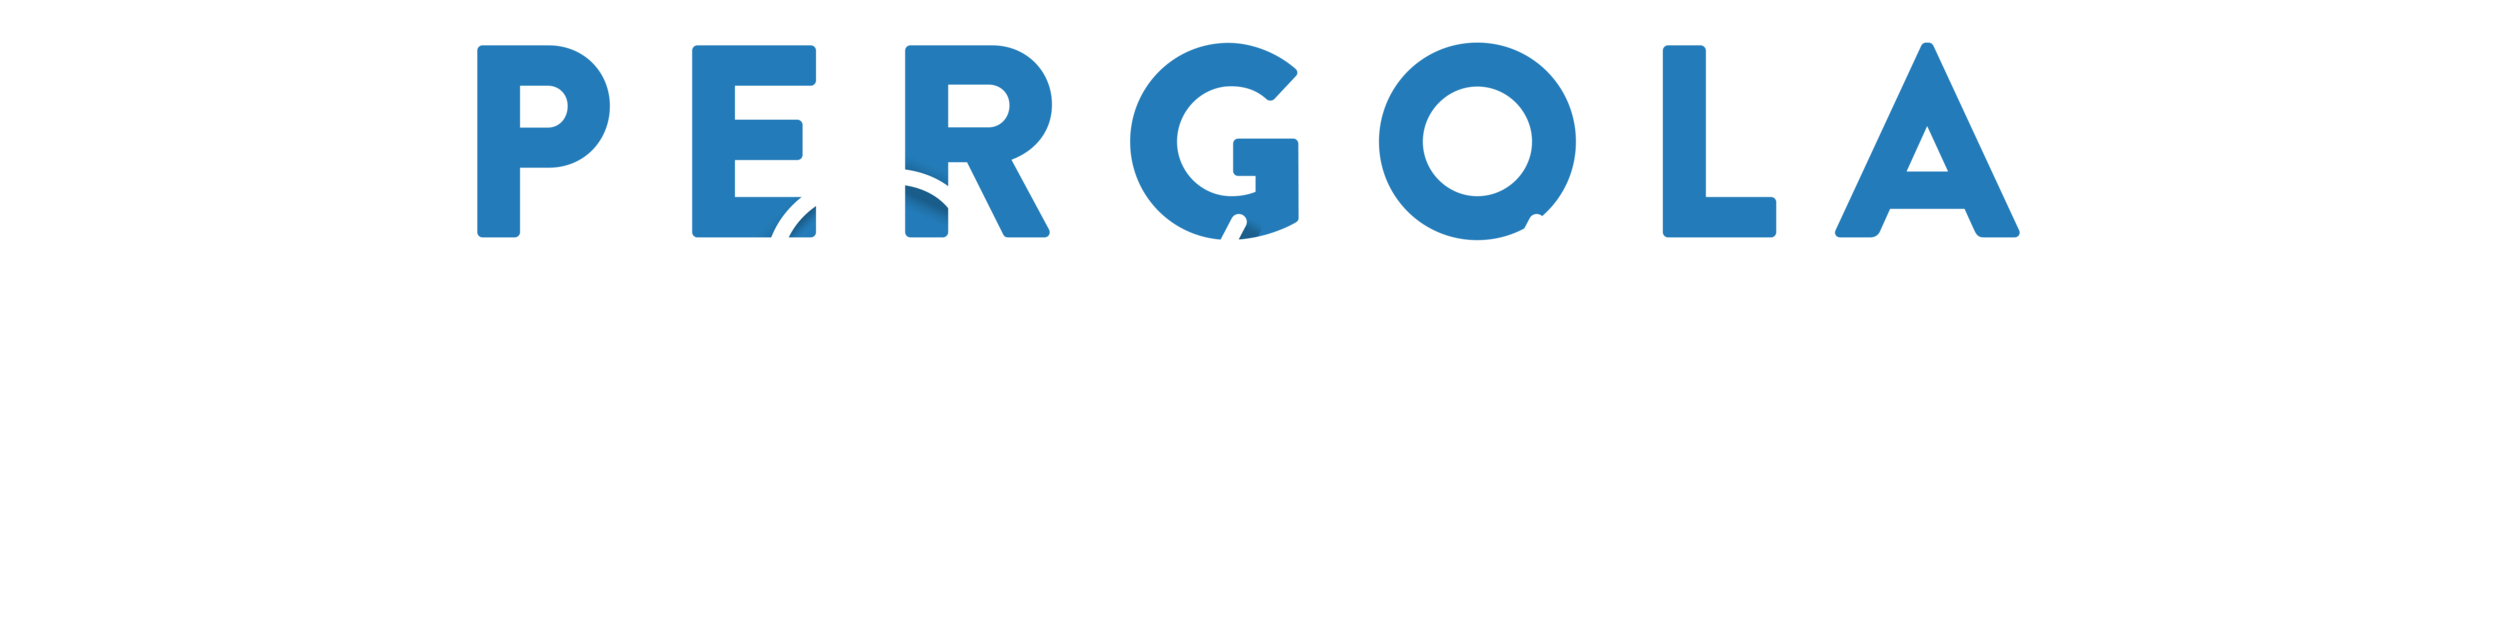 PERGOLA PADDINGTON